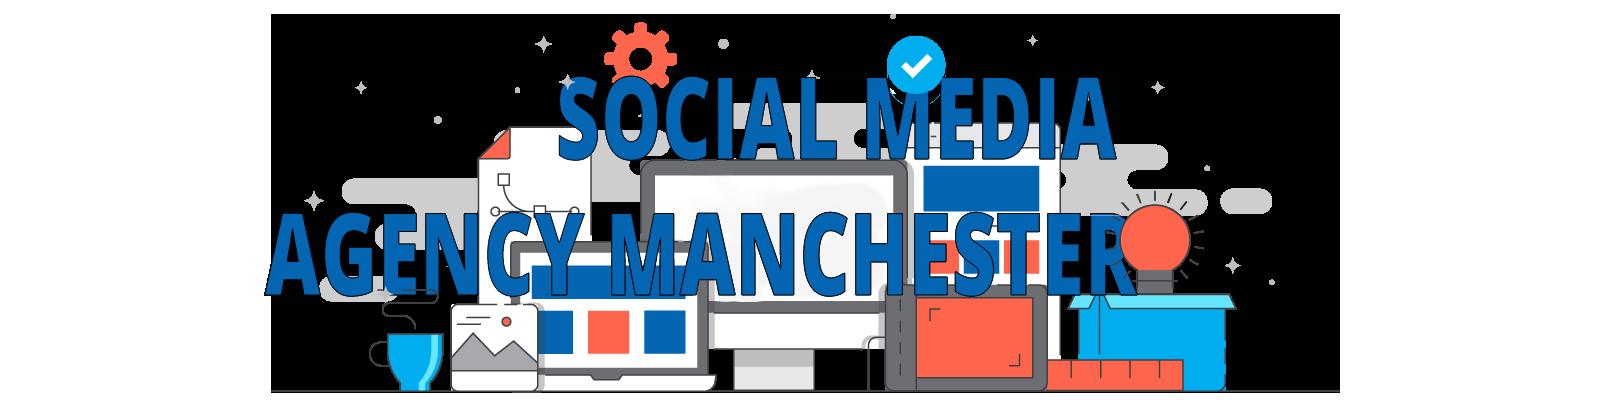 seek social social media agency manchester header with transparent background